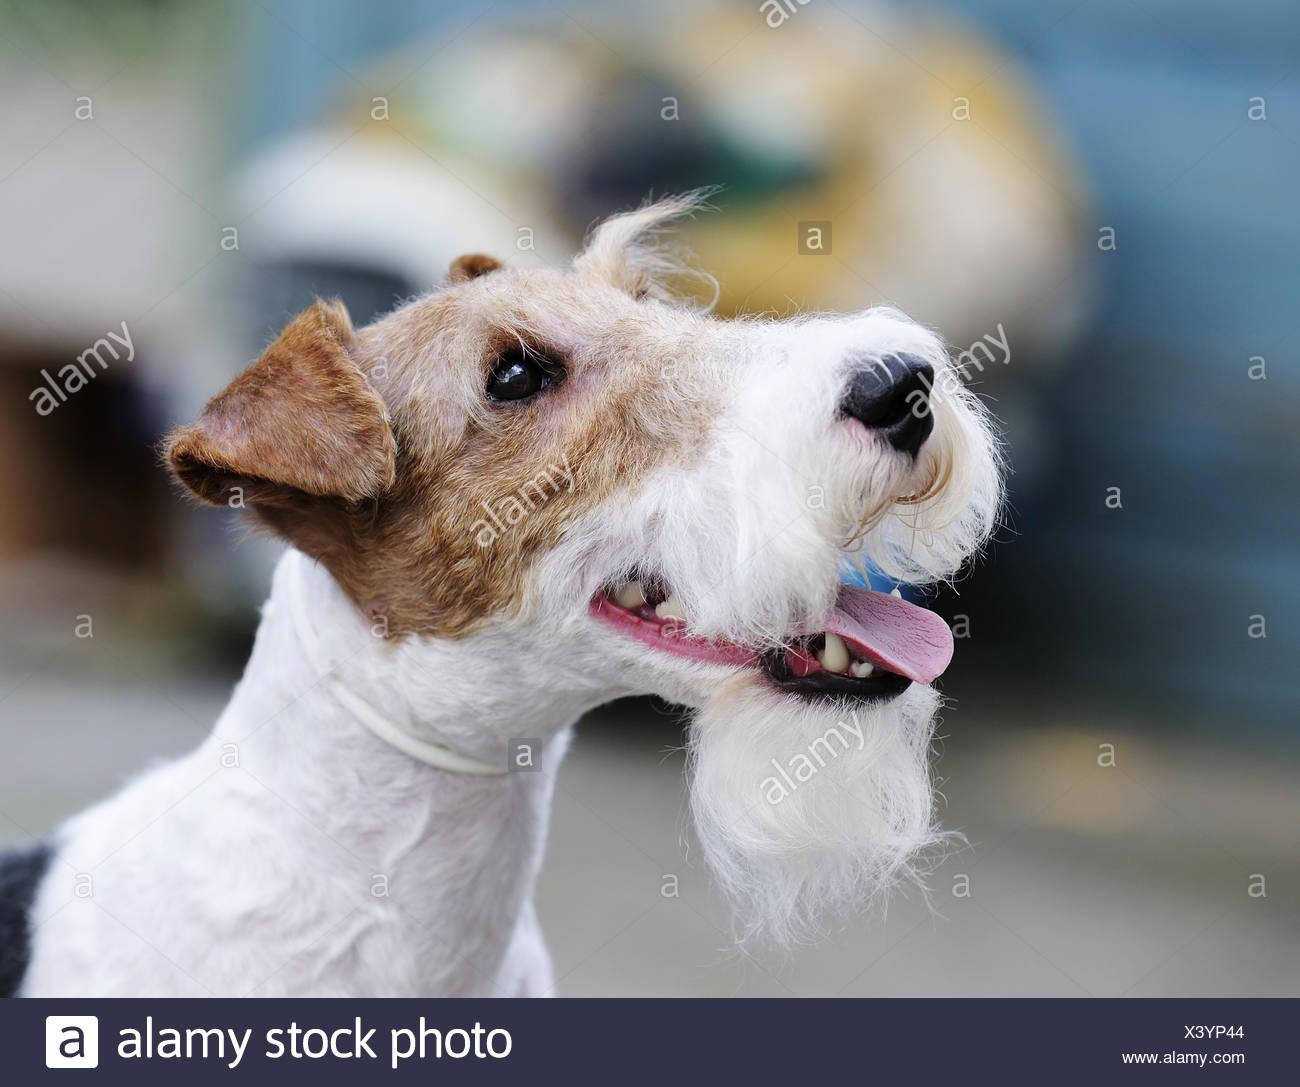 Pedigree Fox Terrier Stockfotos & Pedigree Fox Terrier Bilder - Alamy